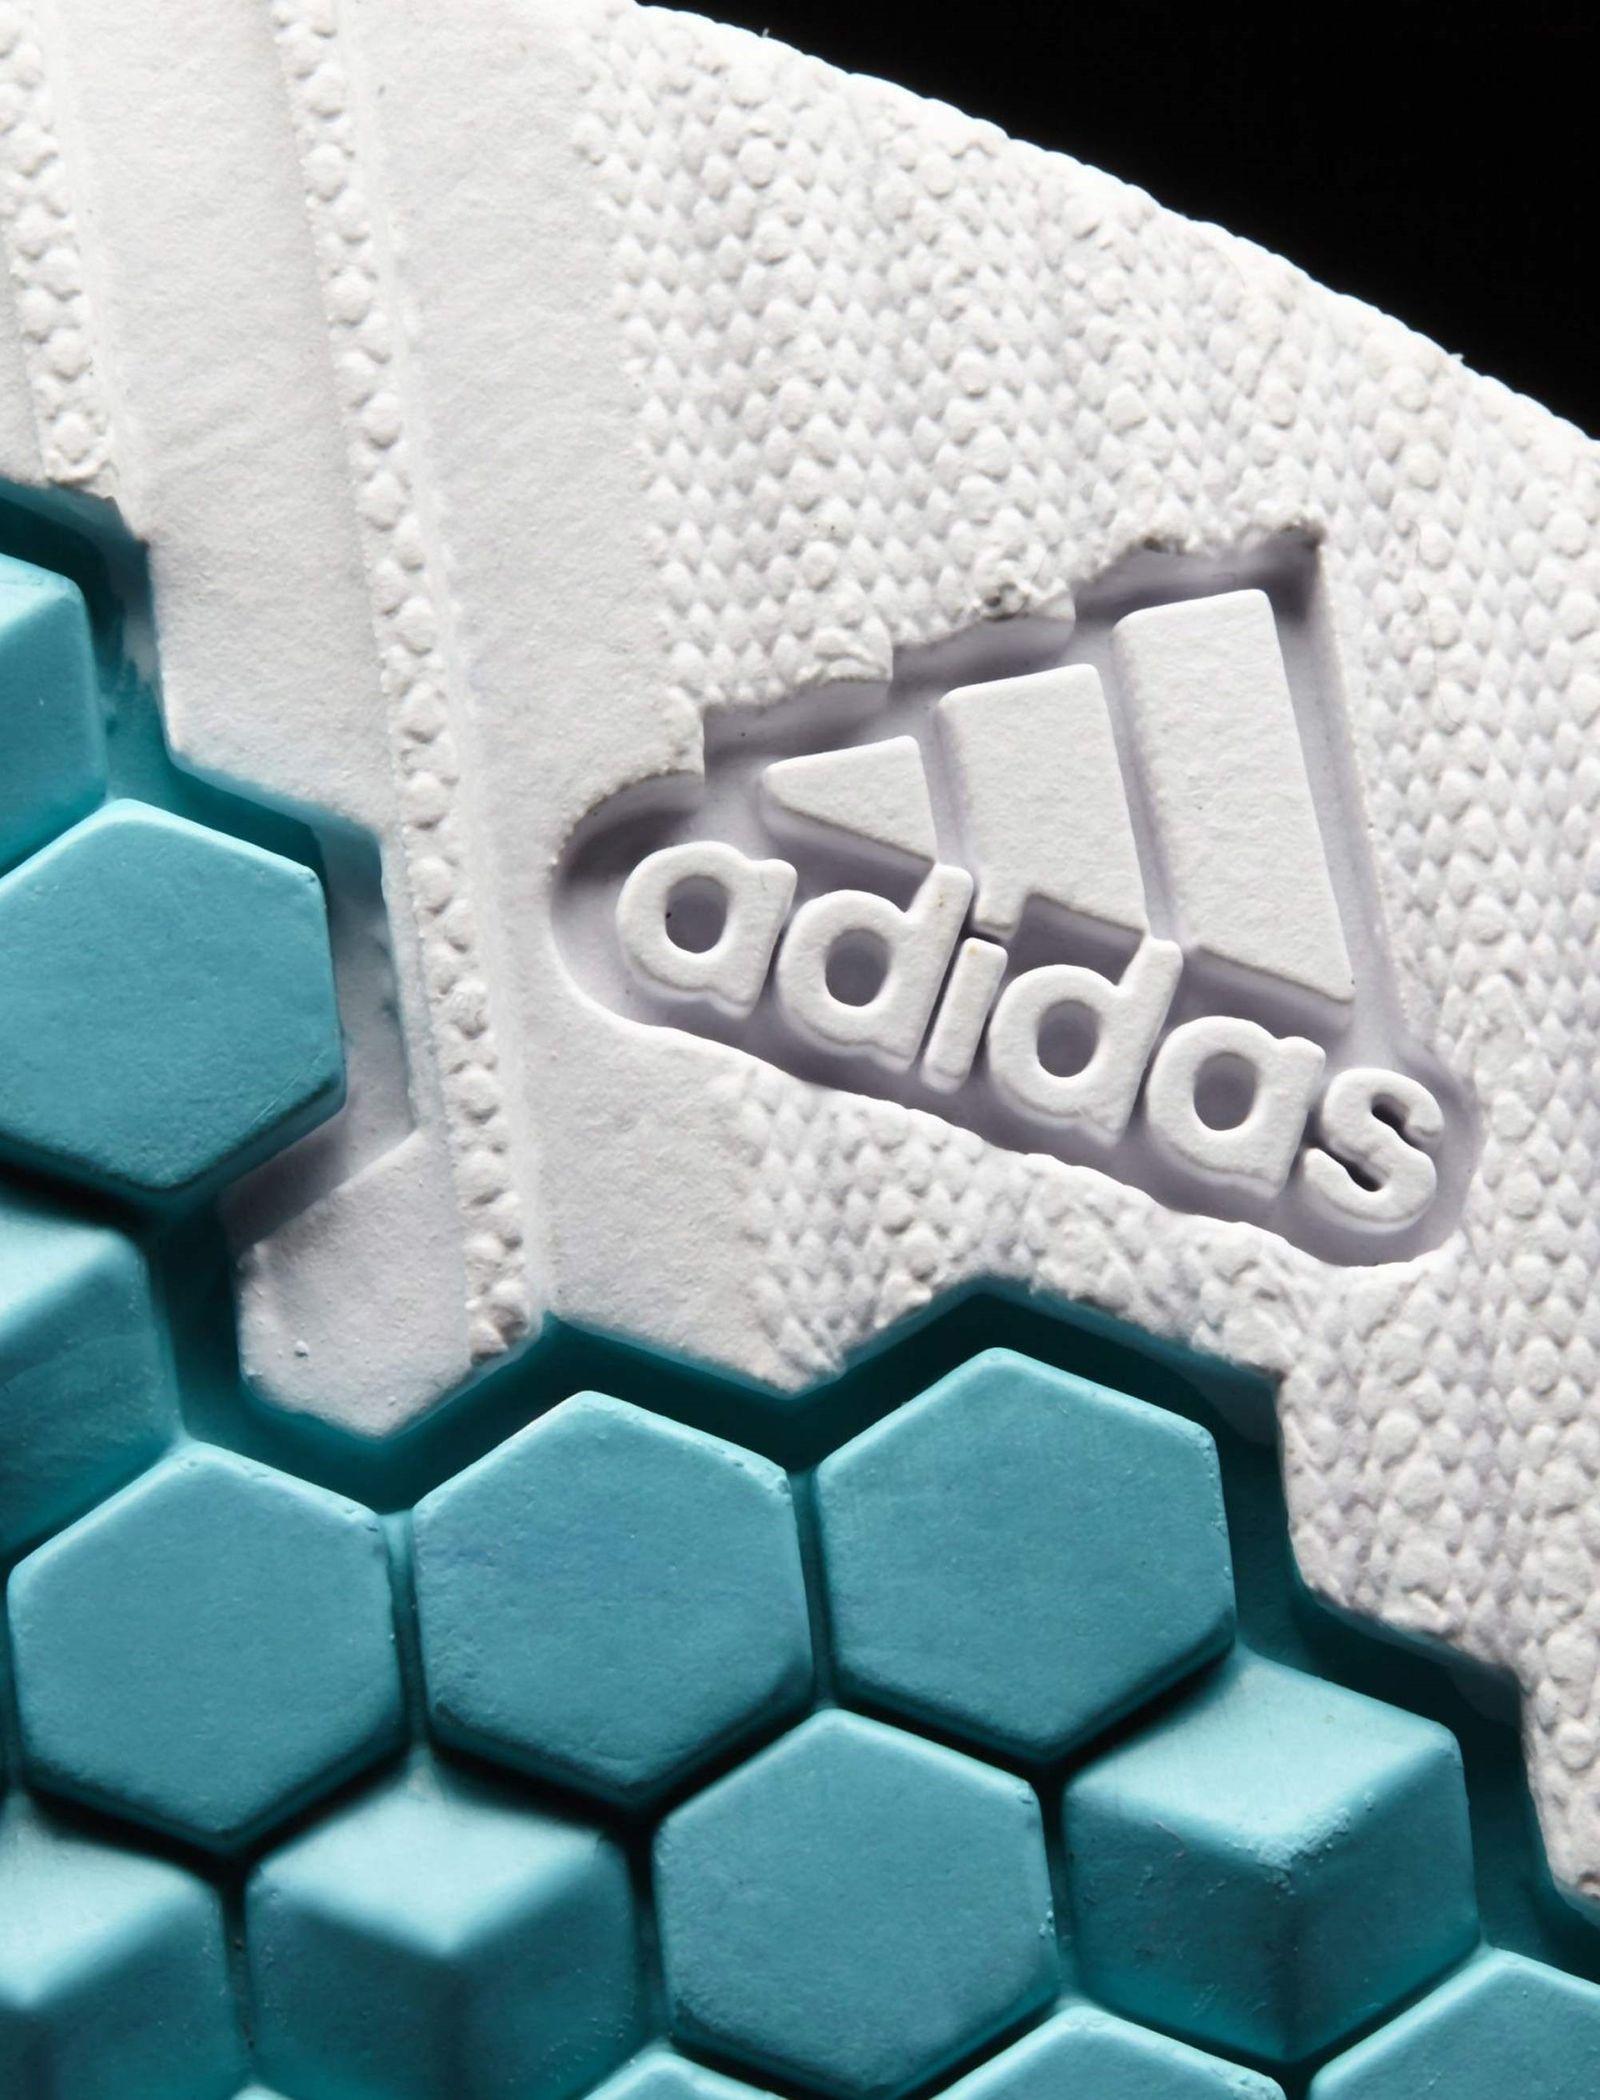 کفش فوتبال بندی پسرانه RapidaTurf Messi - آدیداس - آبی و سفید - 8